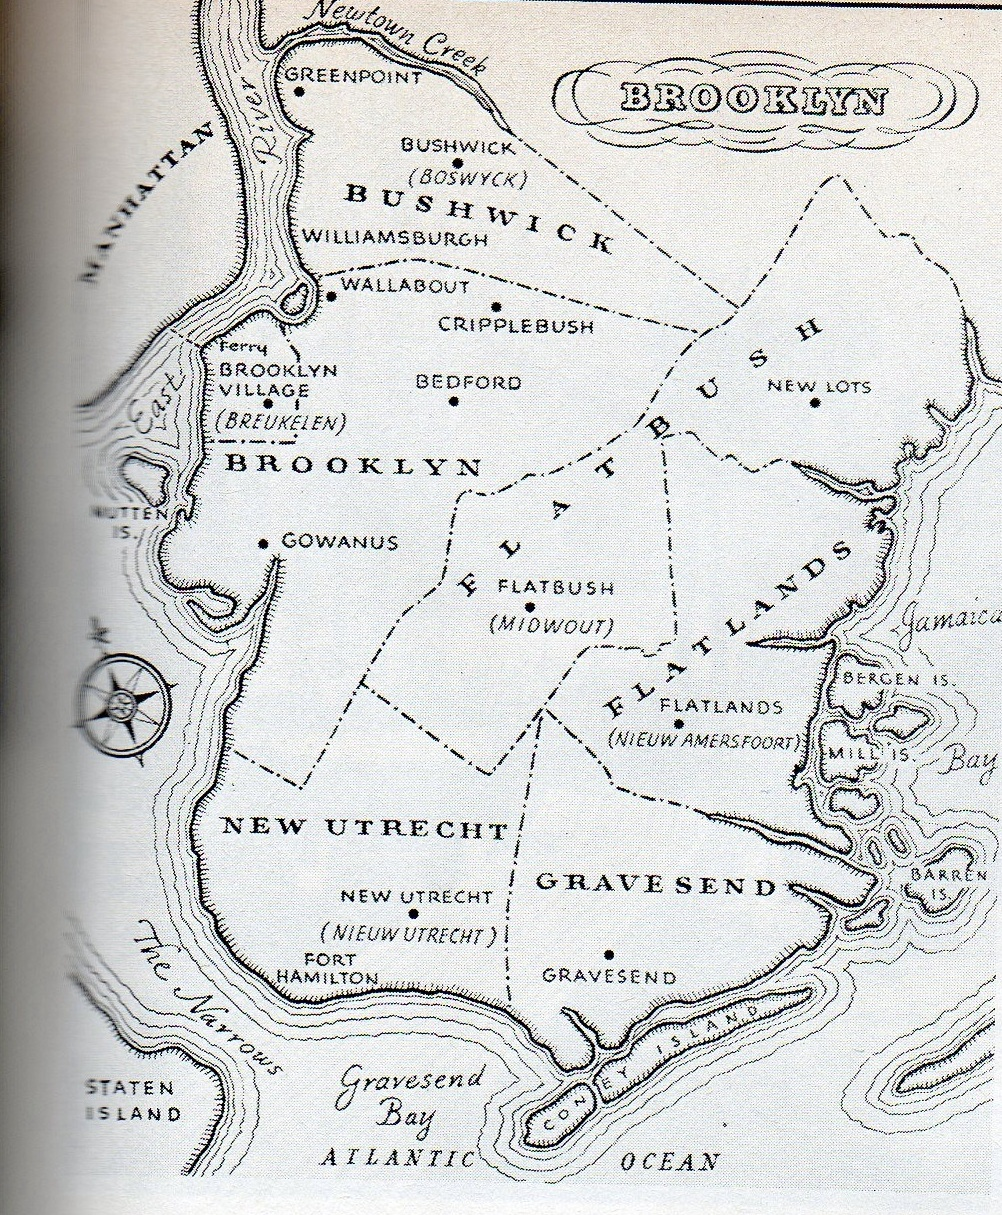 Brooklyns Lost Village Of Cripplebush Ephemeral New York - Brooklyn on the us map